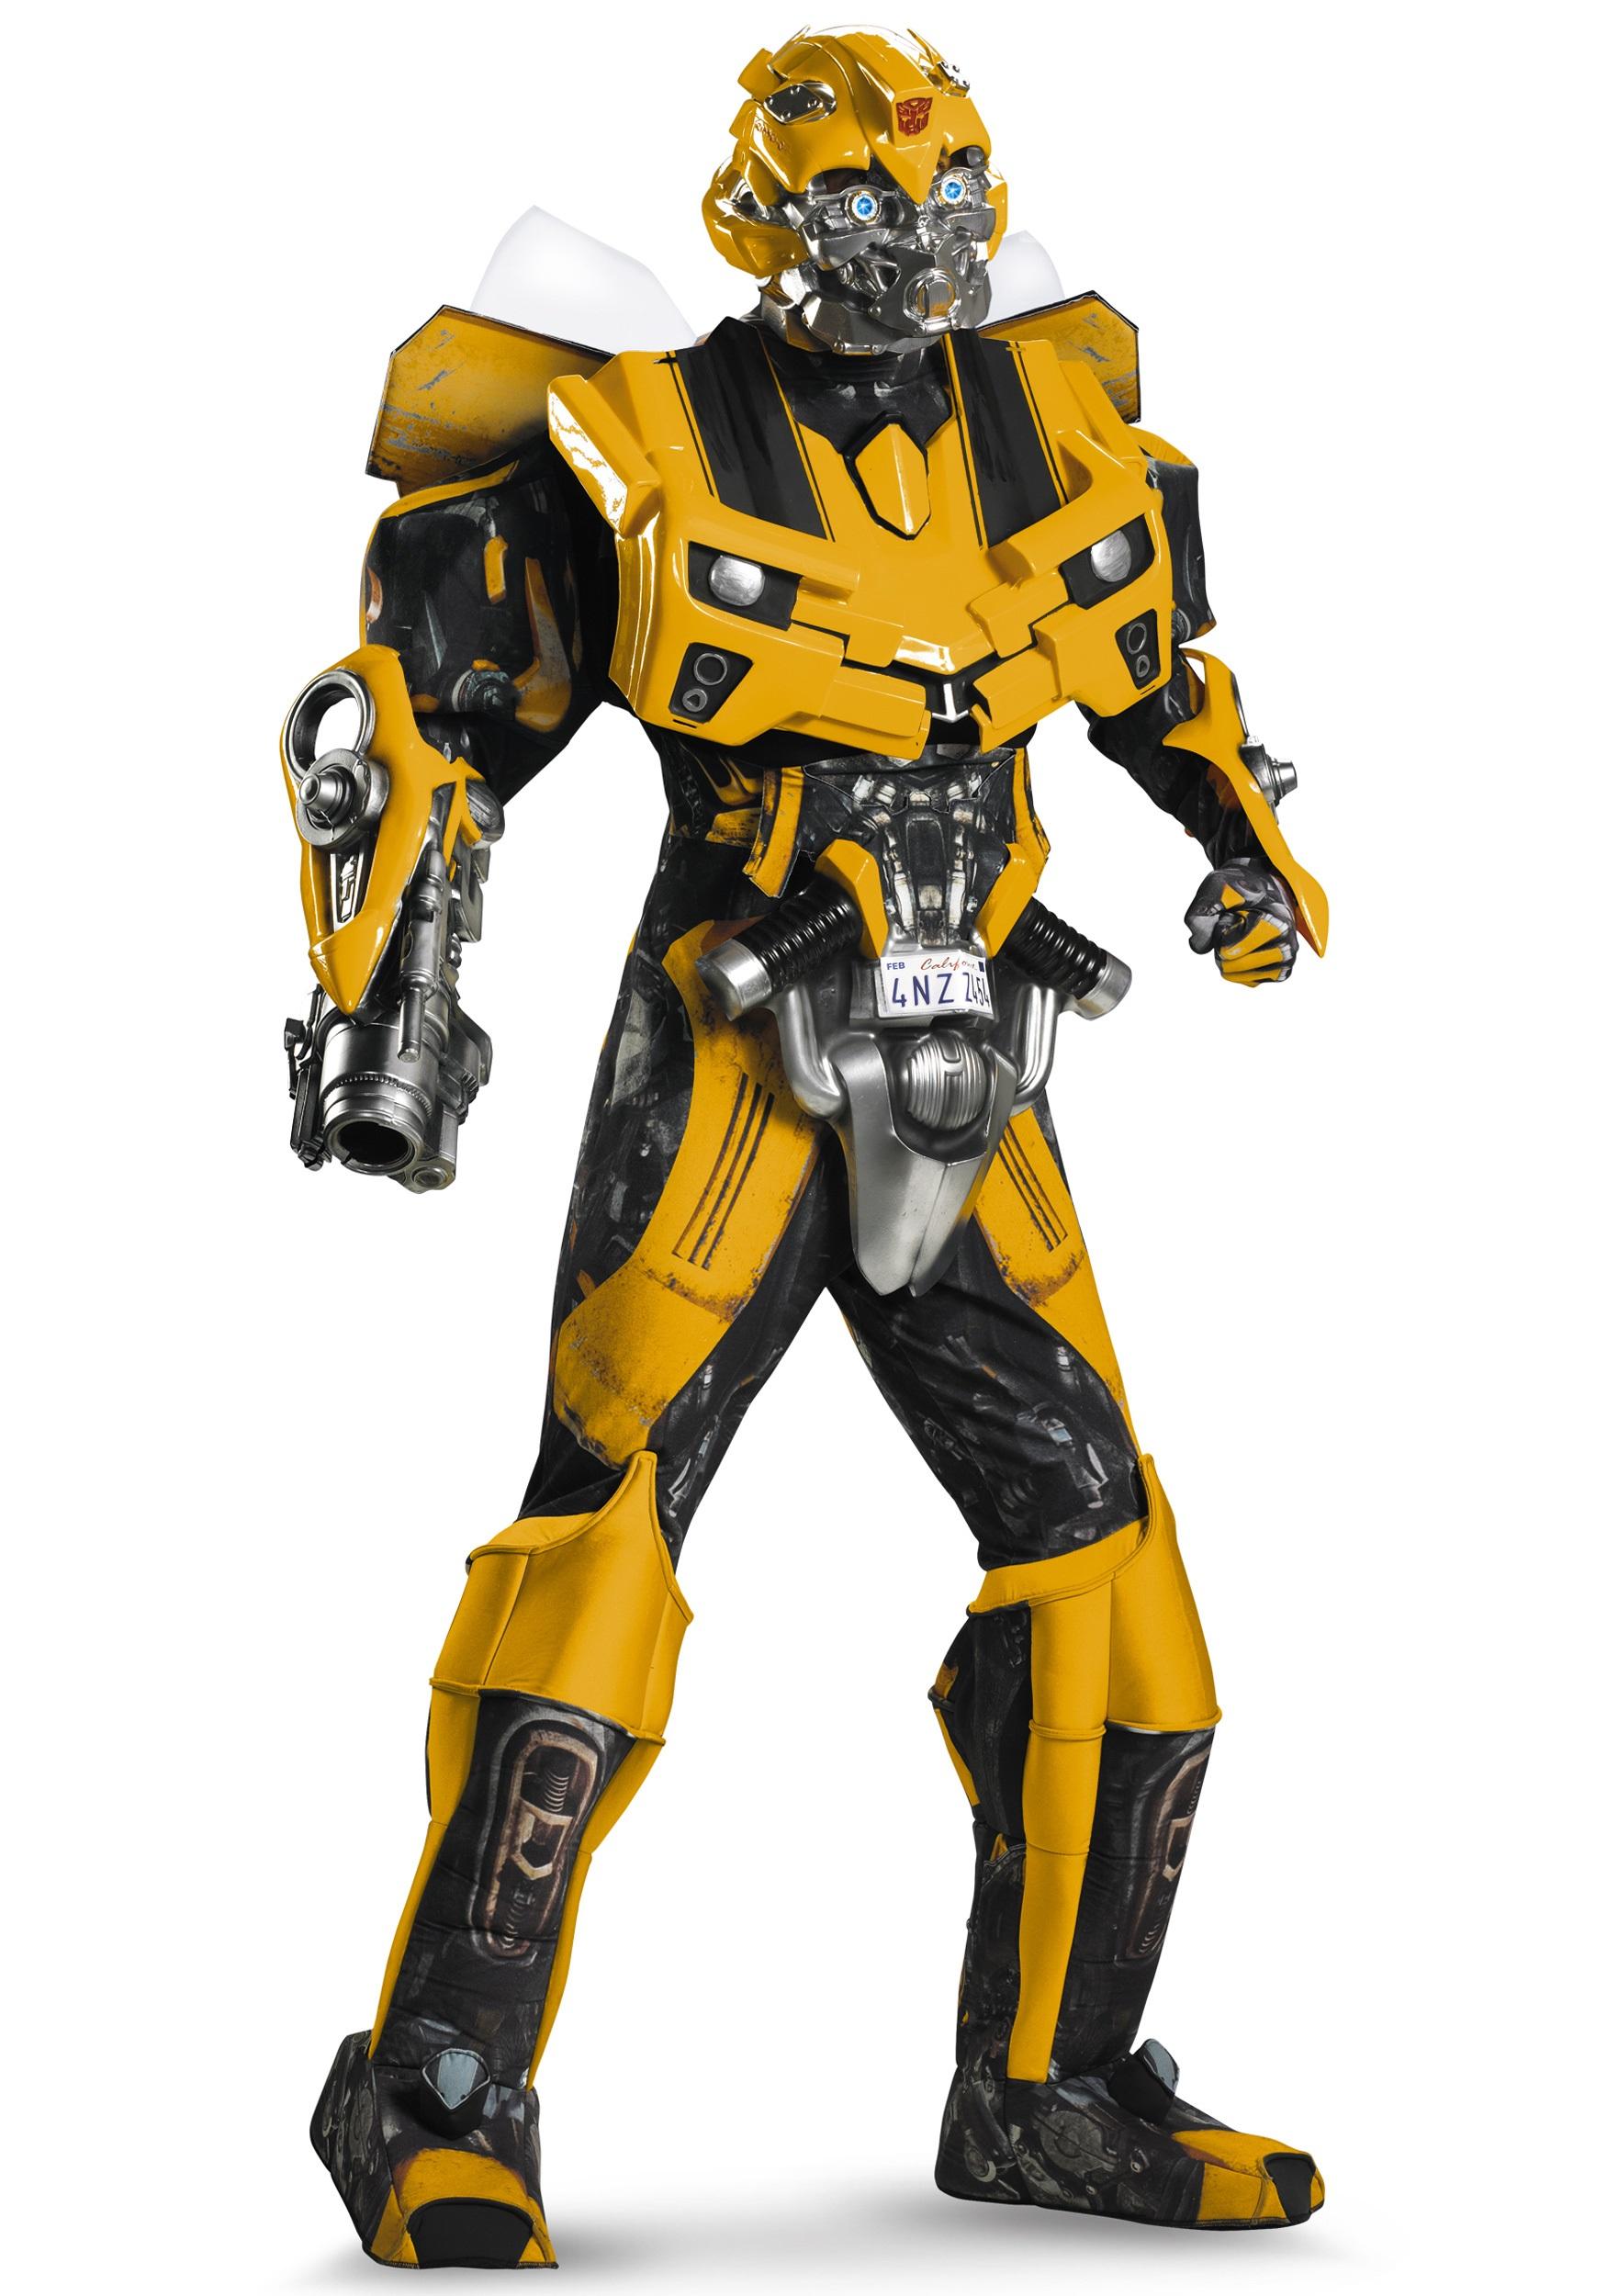 Transformers Costume - Cartoon & Movie Costumes